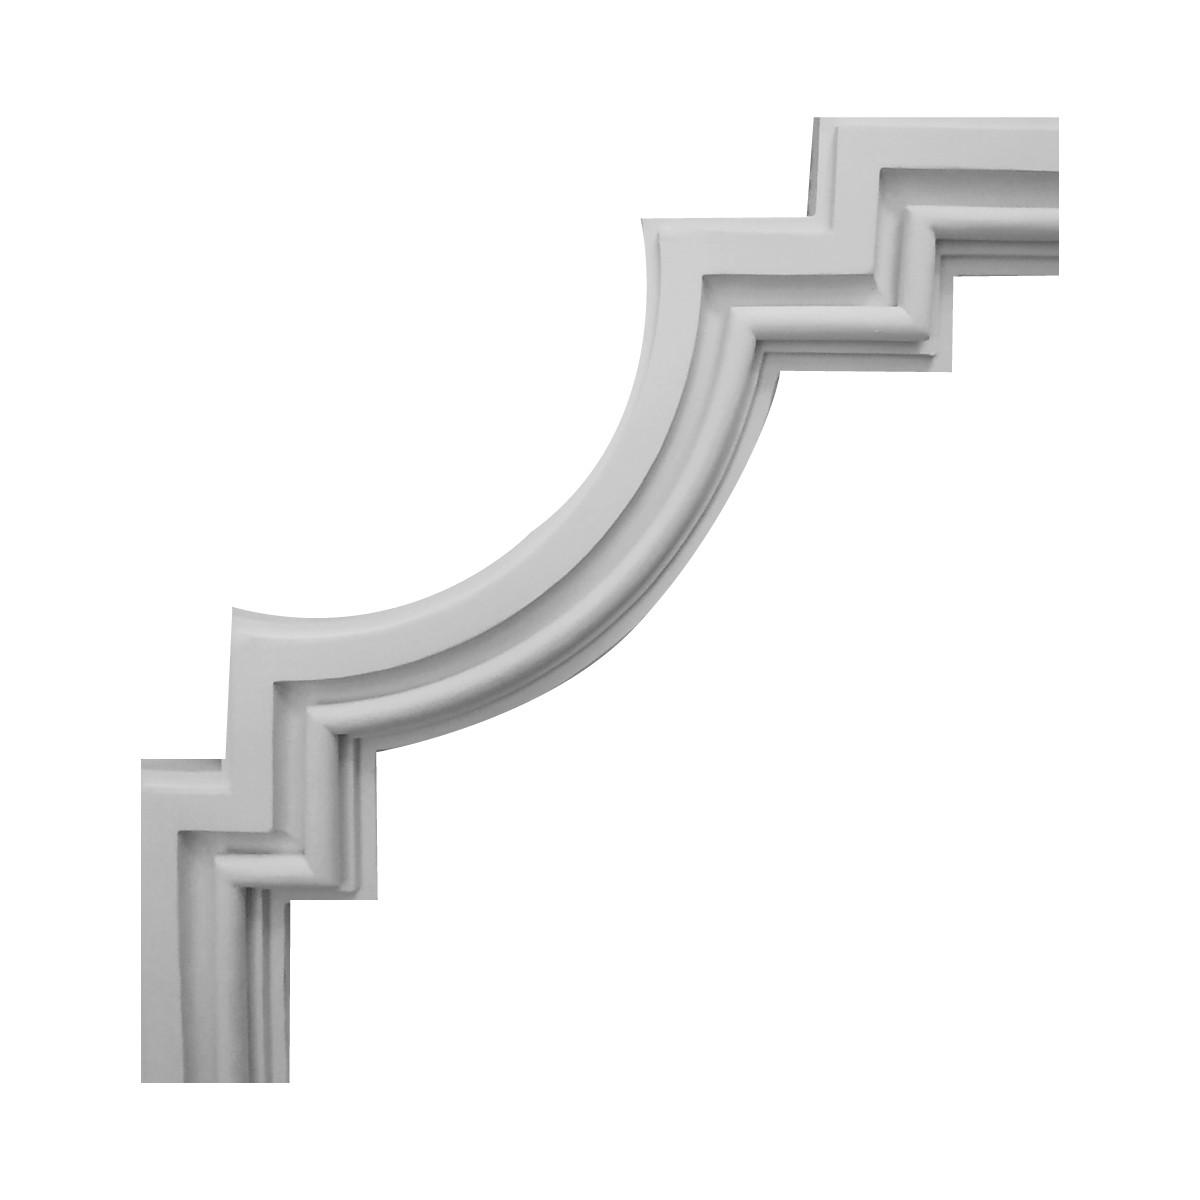 Гипсовая лепнина декоративный угол у-30 h270х270мм